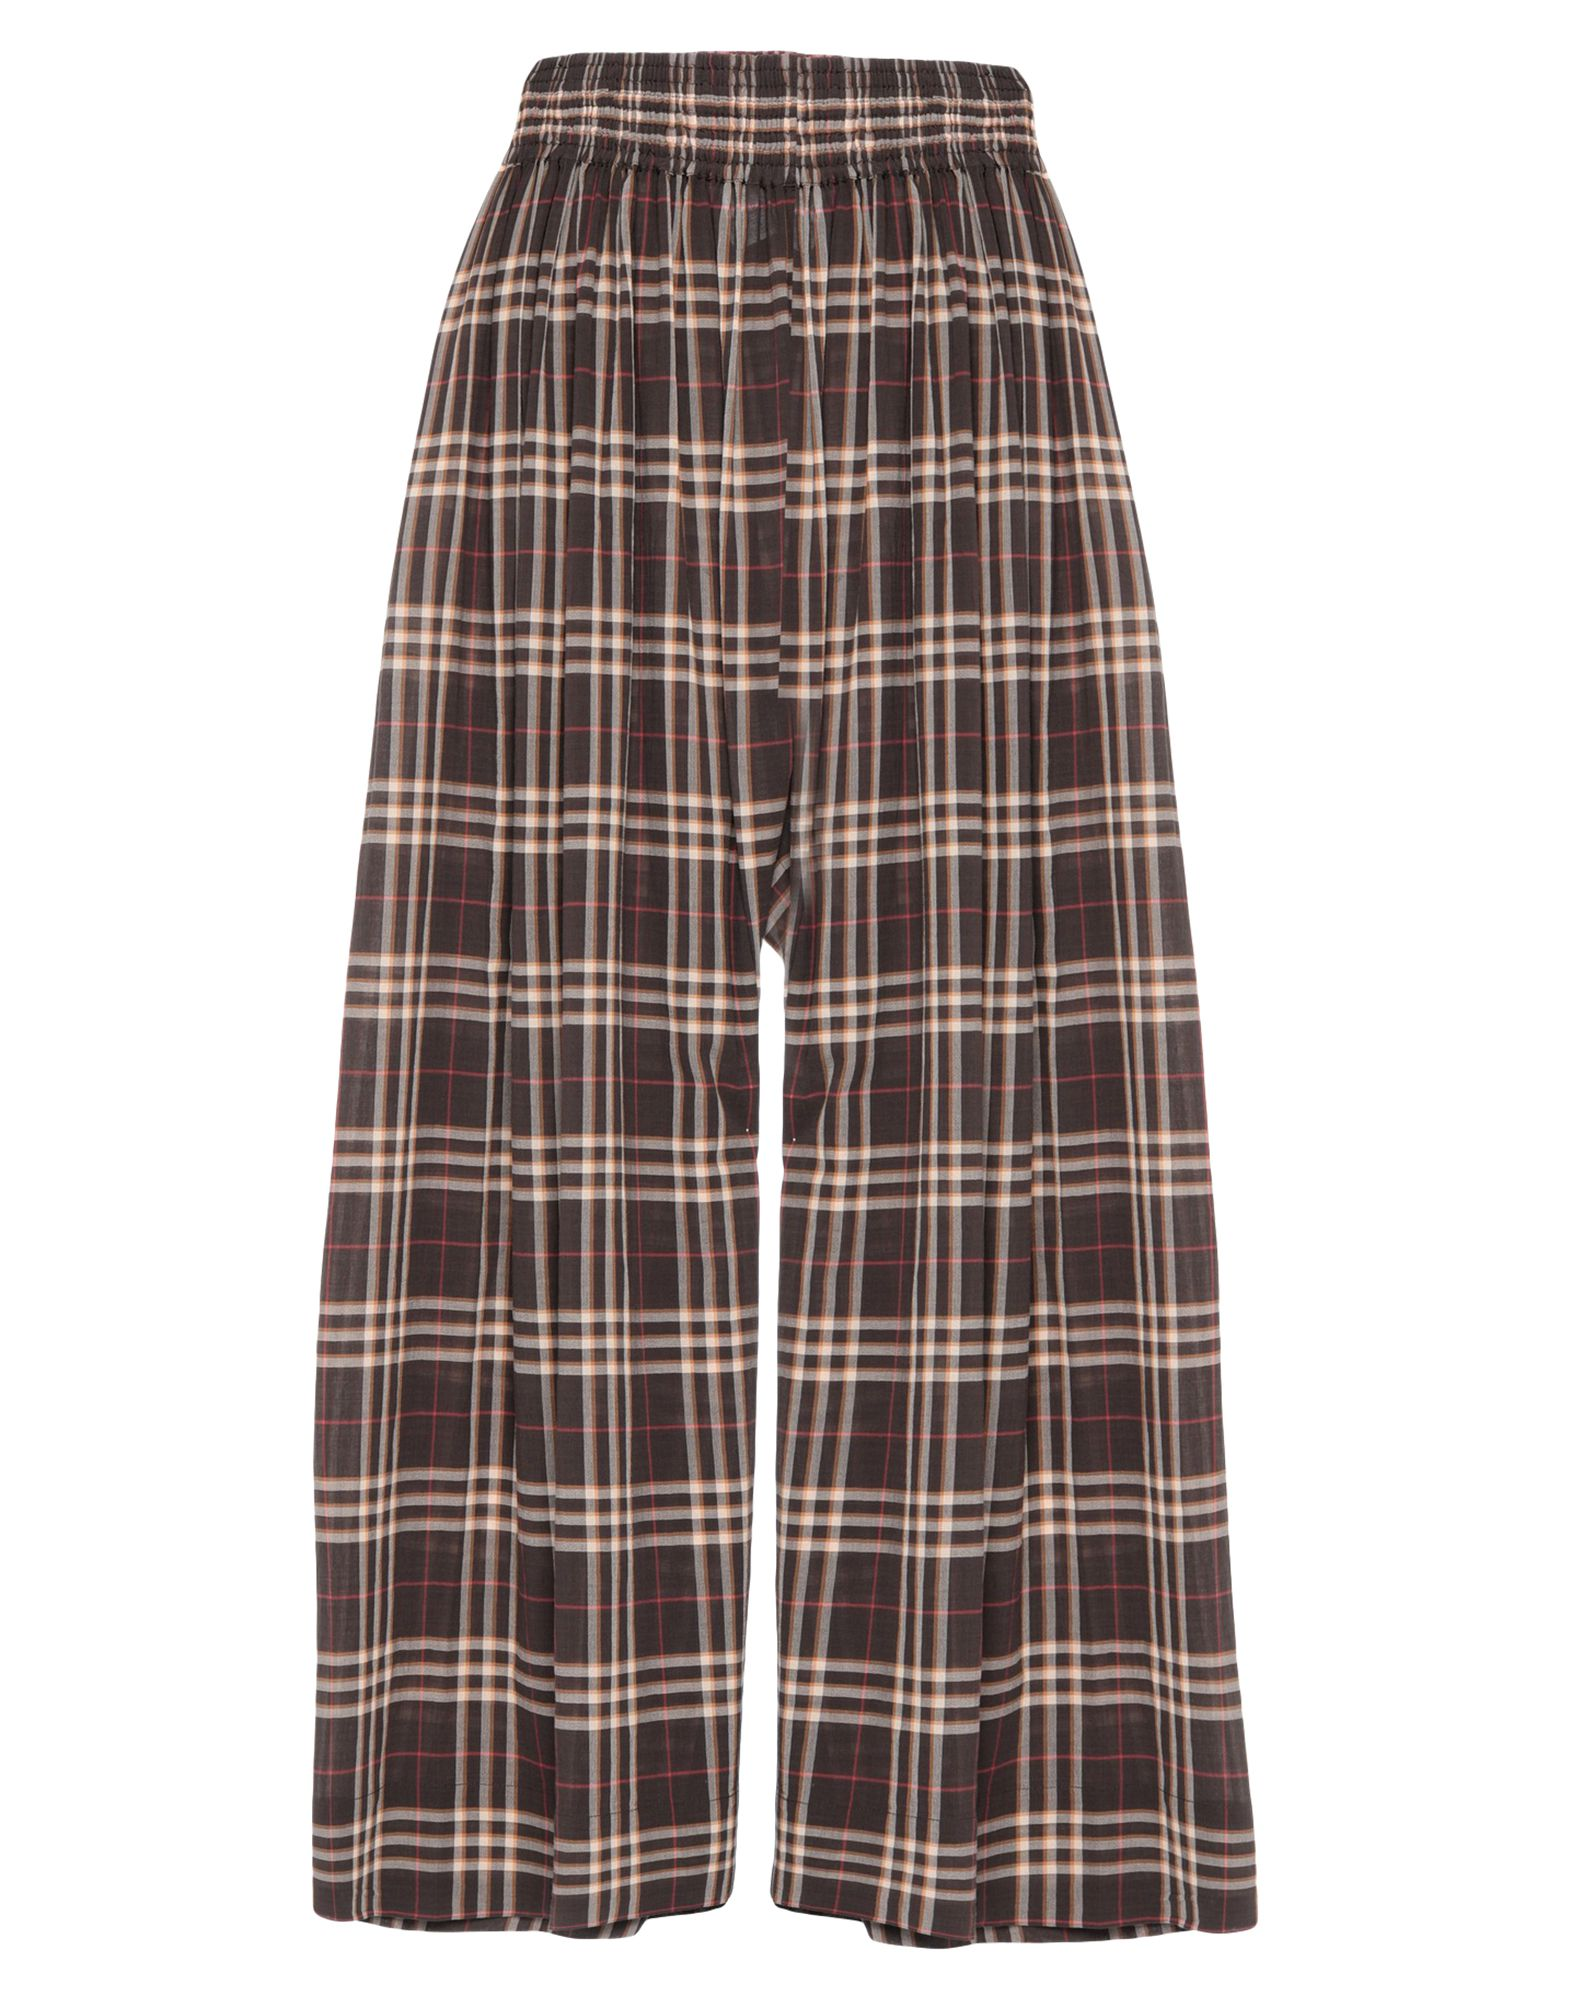 ANTONELLI Повседневные брюки antonelli брюки капри